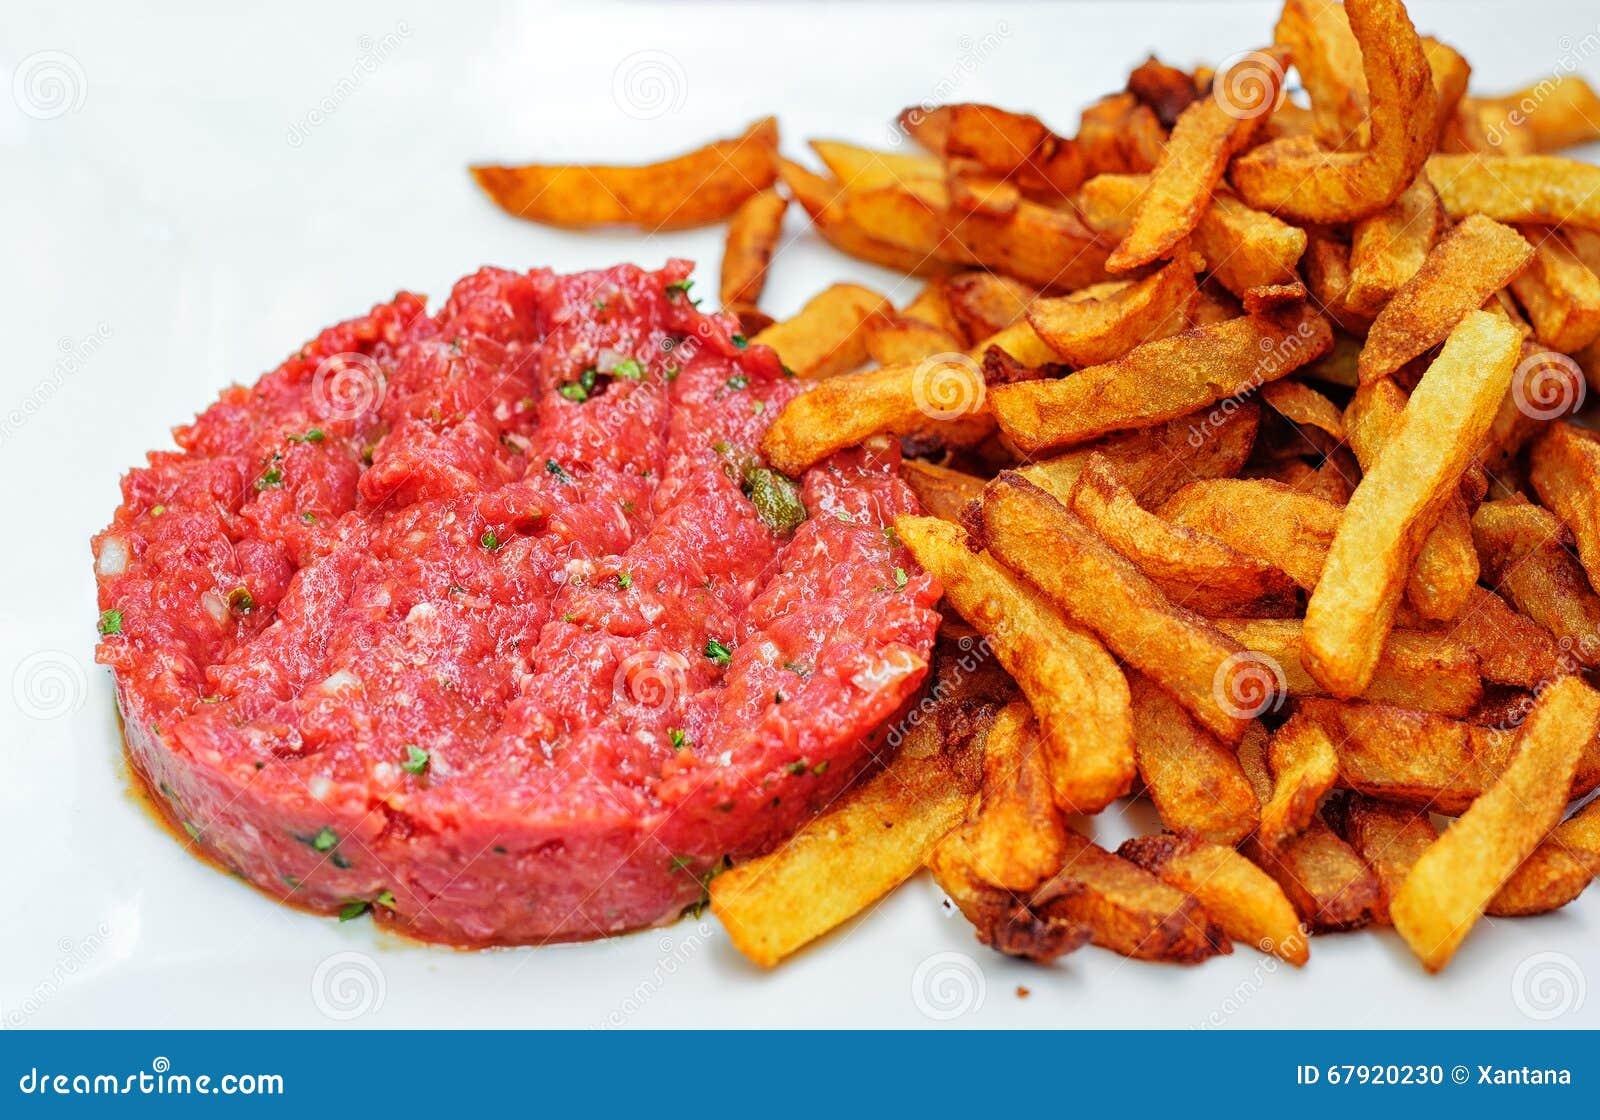 Novogodišnja gozba Steak-tartare-served-french-fries-potato-chips-raw-minced-beef-meat-white-67920230